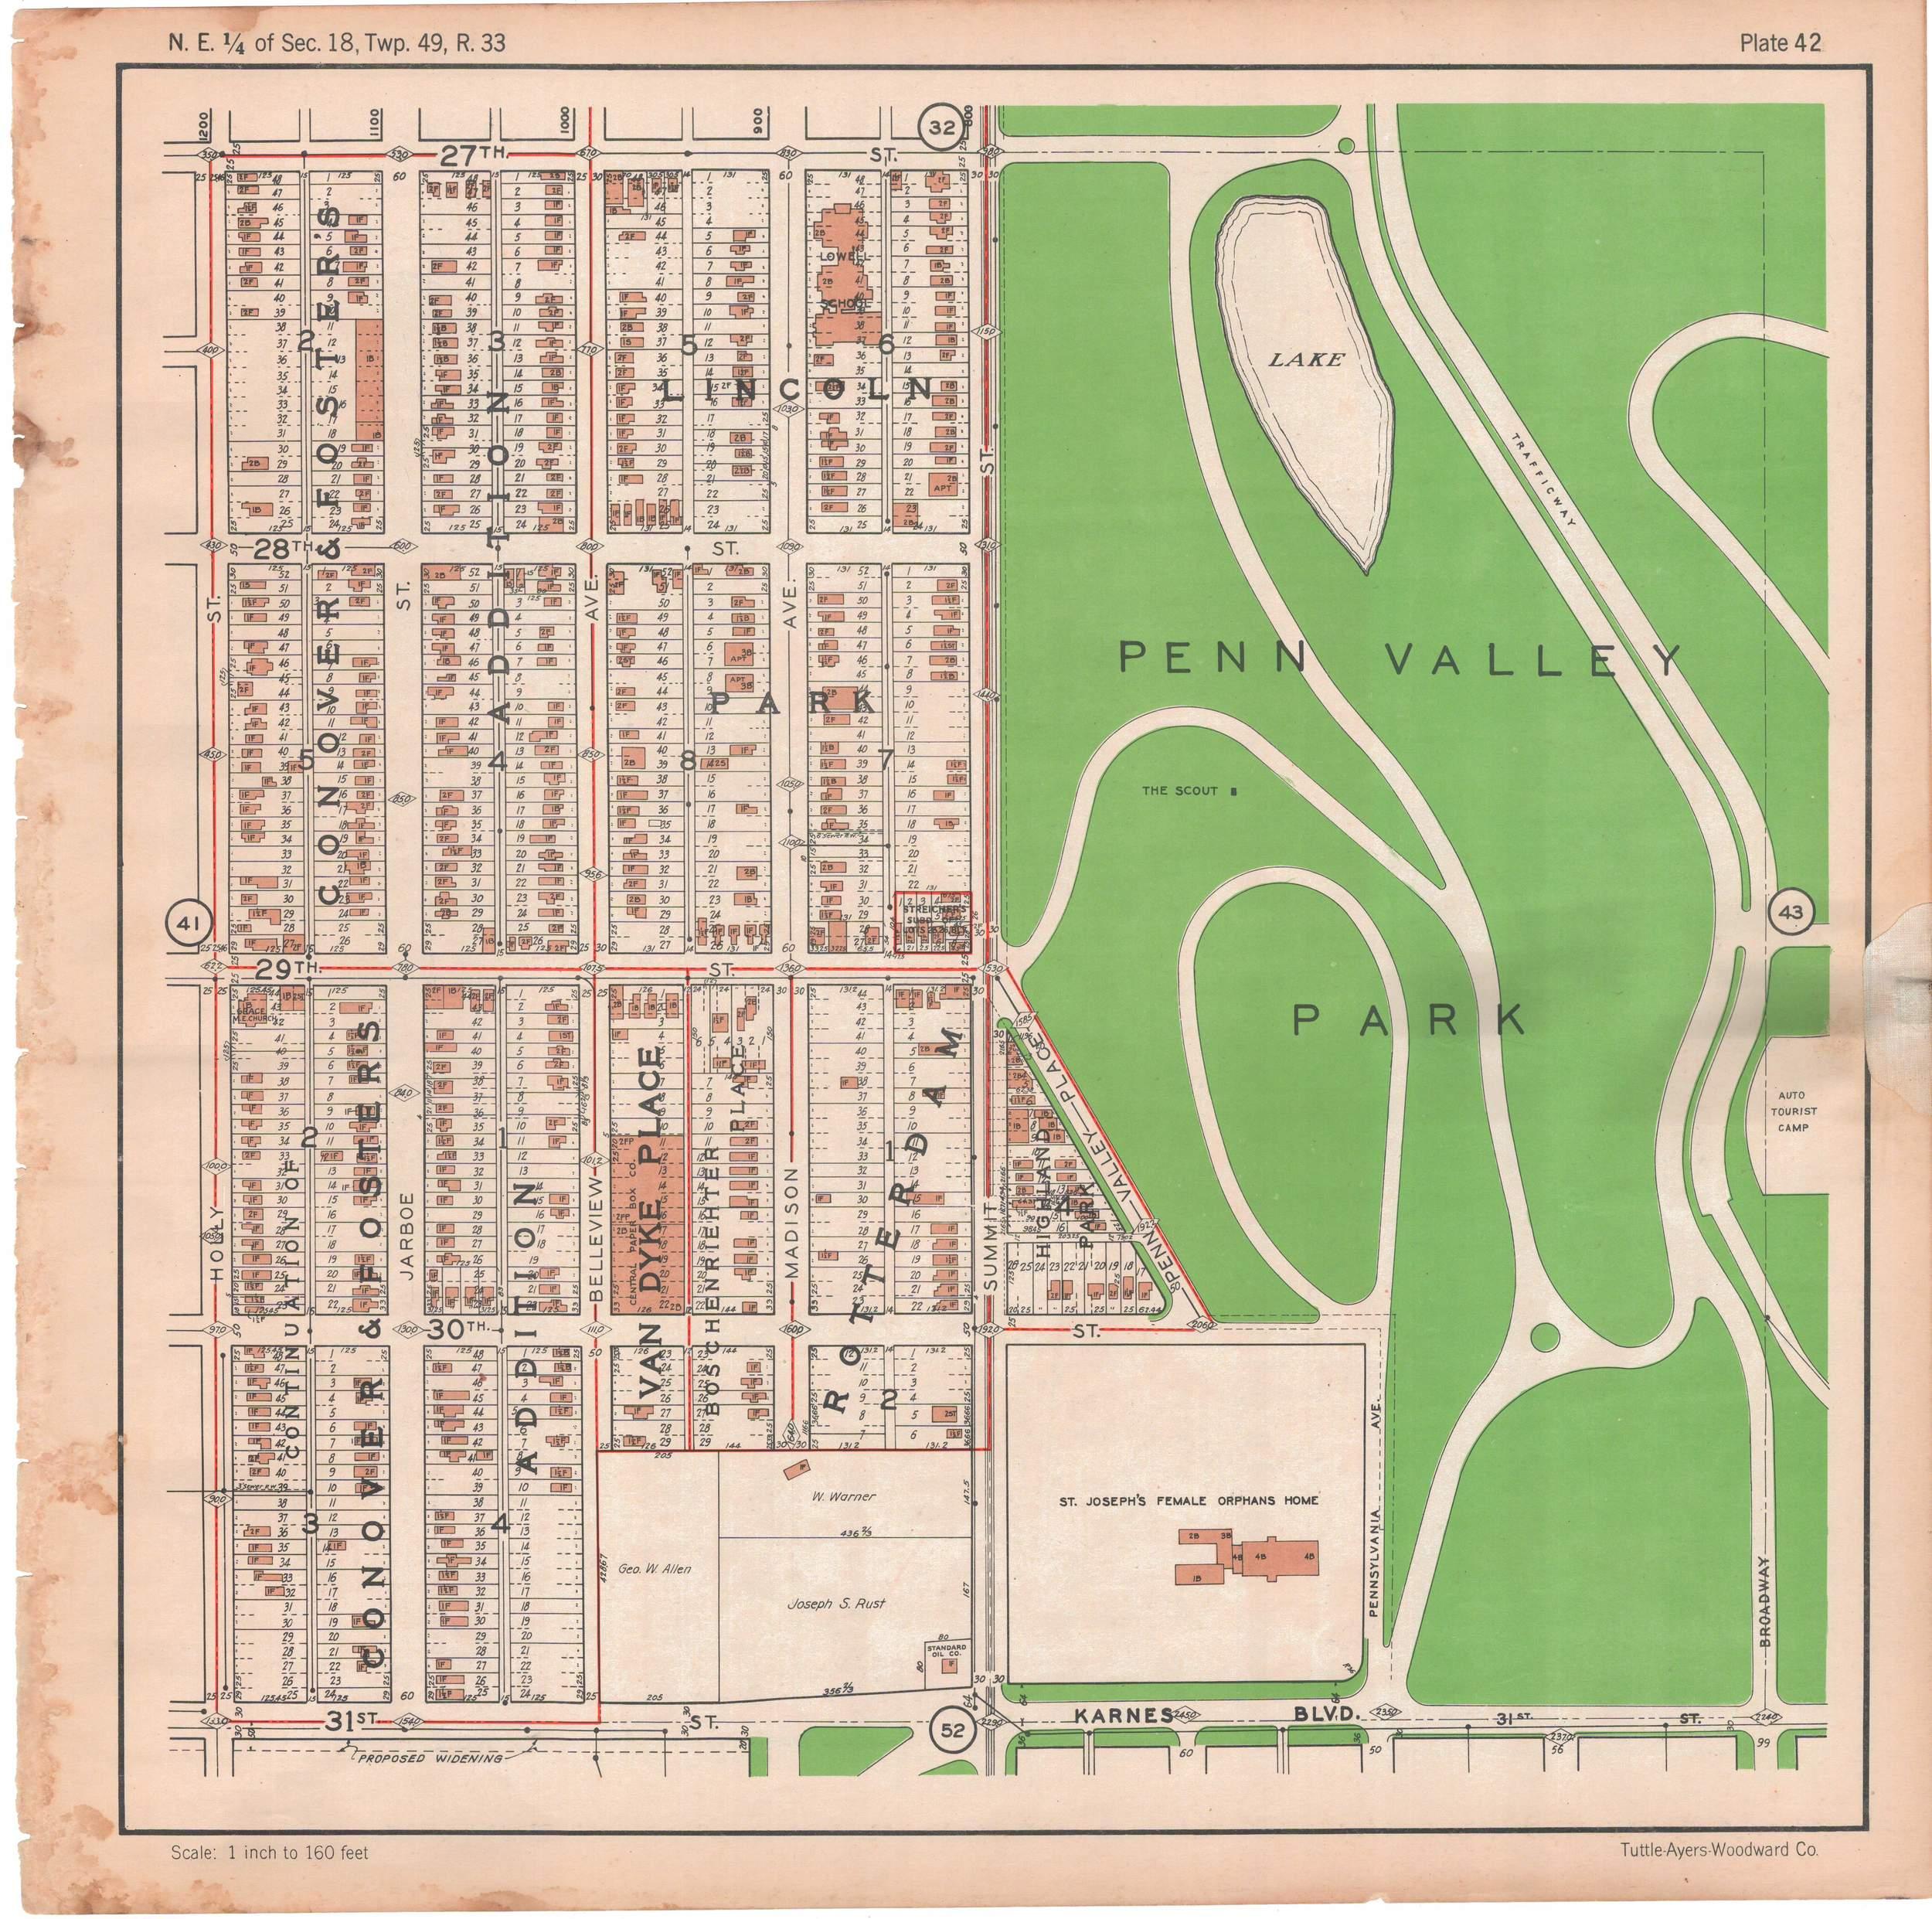 1925 TUTTLE_AYERS_Plate 42.JPG